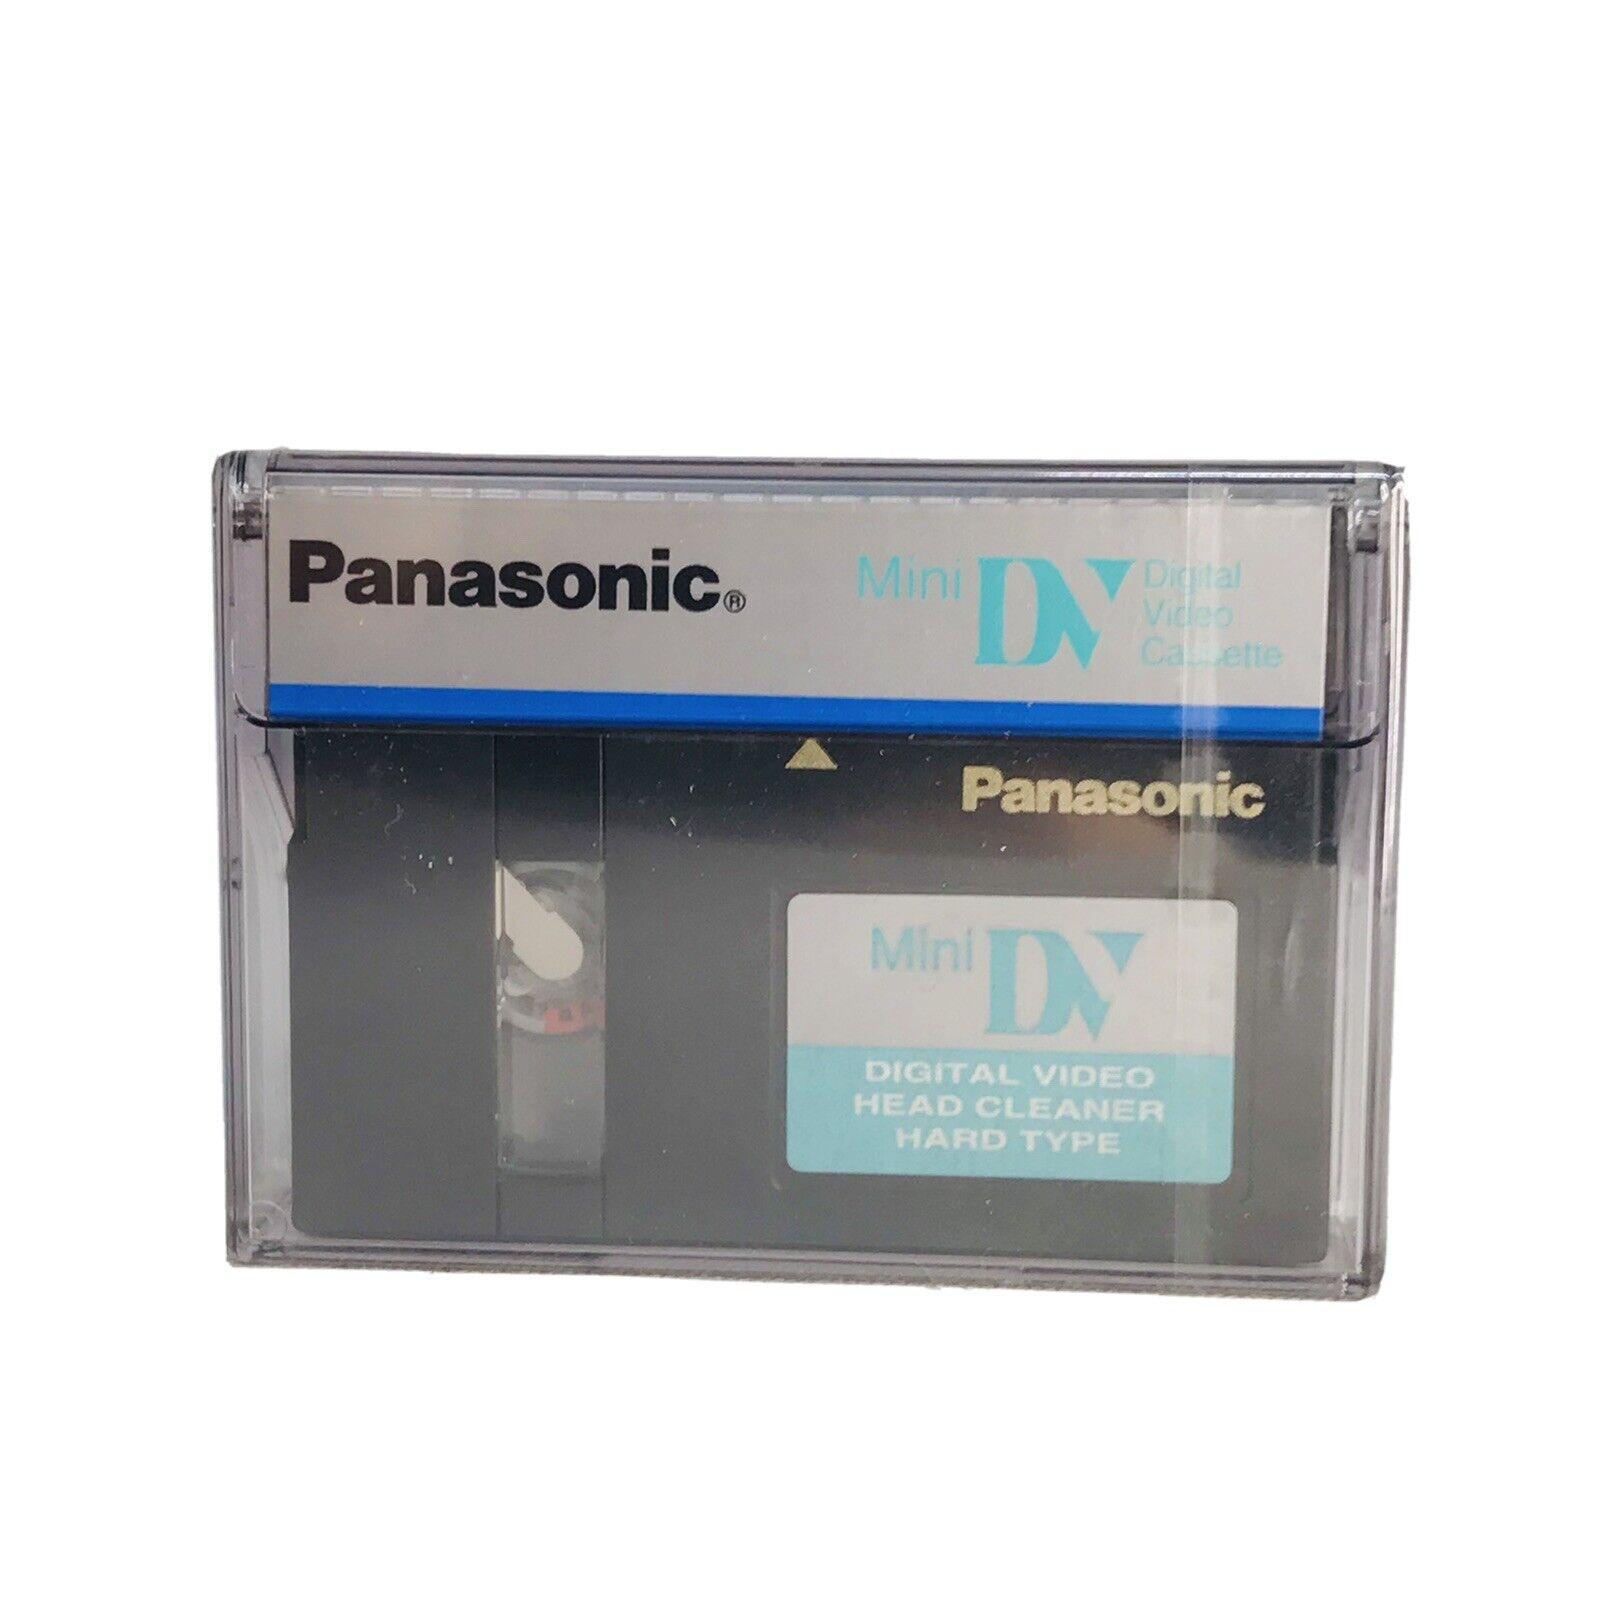 Panasonic Mini DV Digital Video Head Cleaner Hard Type New and Sealed VFK1451